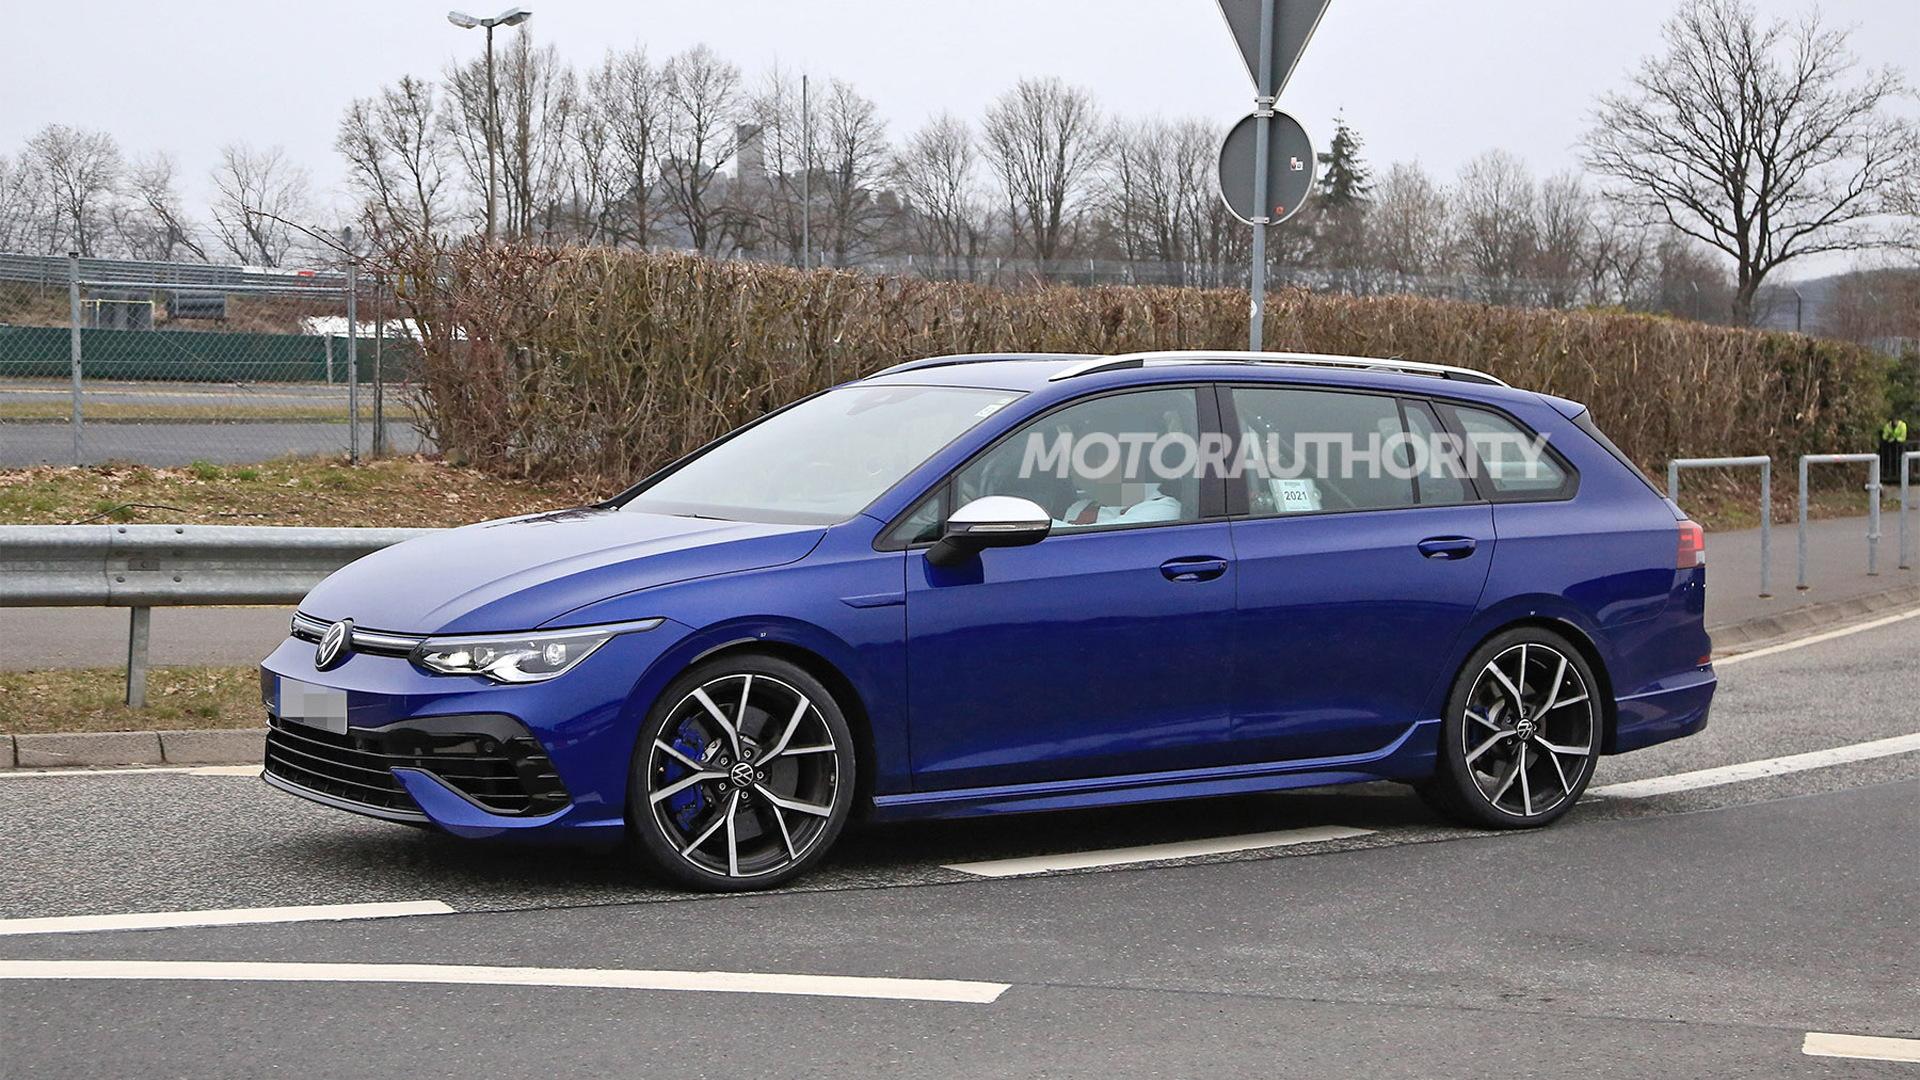 2022 Volkswagen Golf R Variant spy shots - Photo credit:S. Baldauf/SB-Medien